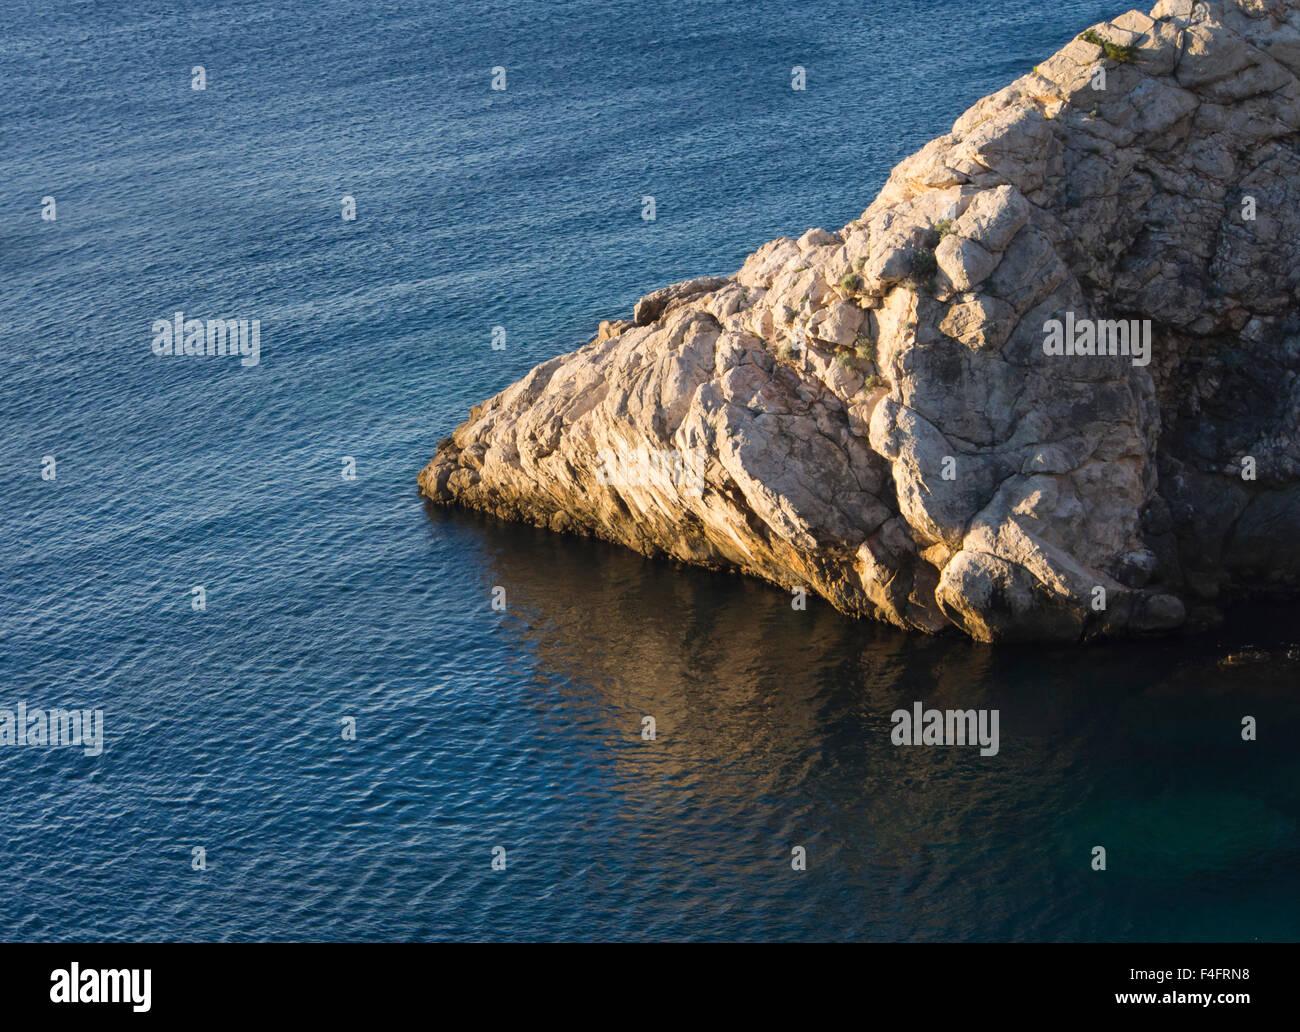 Cliff in yellow sunlight , blue sea, impression of the Dalmatian coast - Stock Image